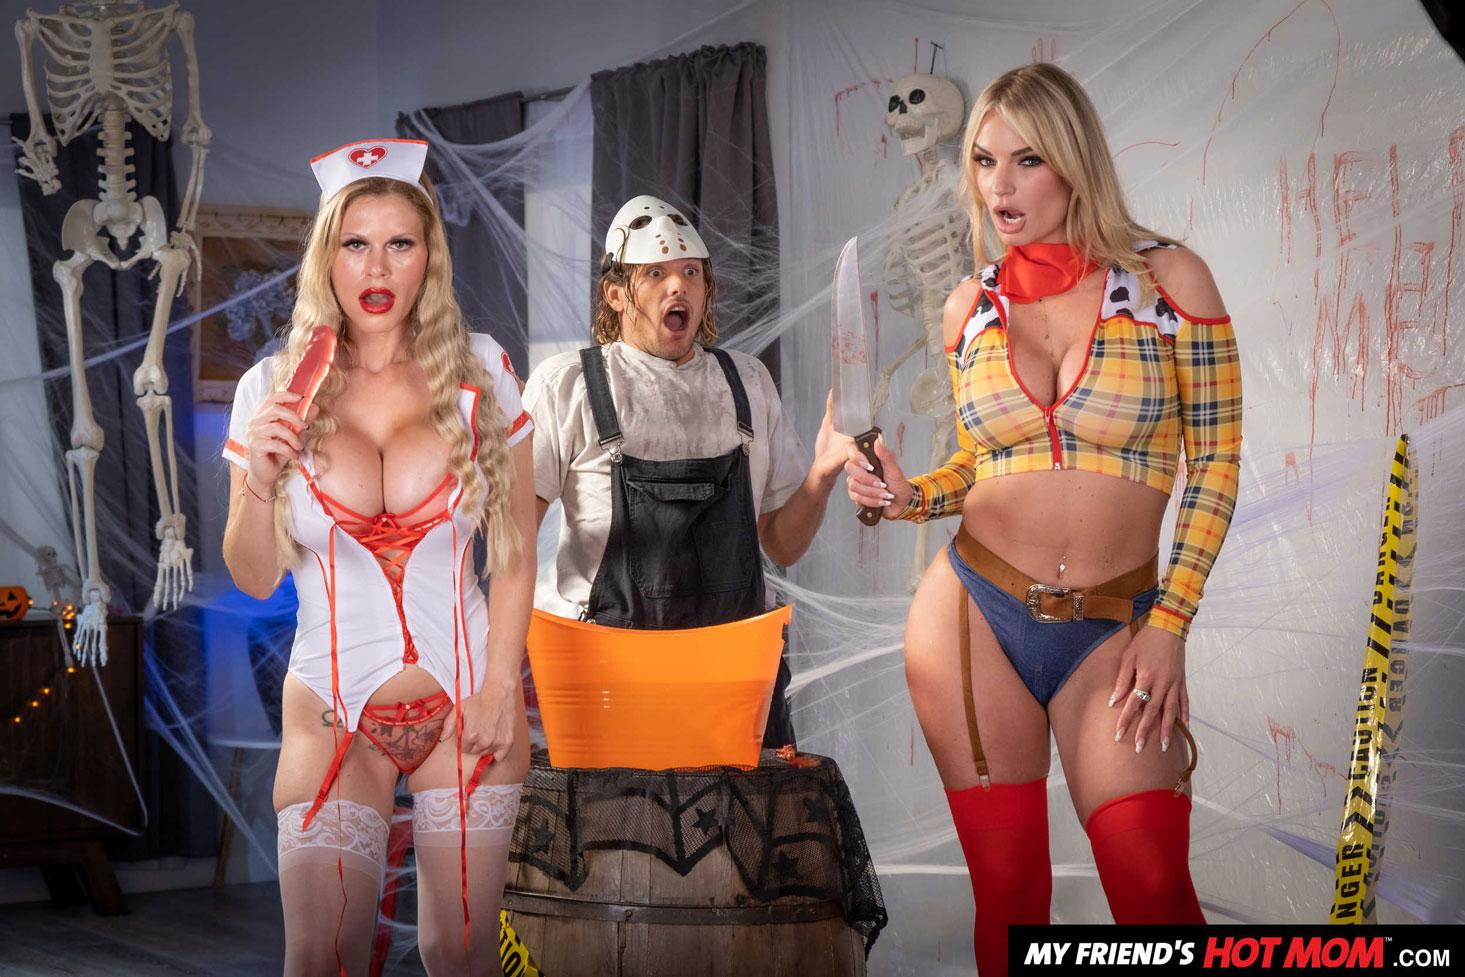 Naughty America - Casca Akashova & Rachel Cavalli Halloween Party 1